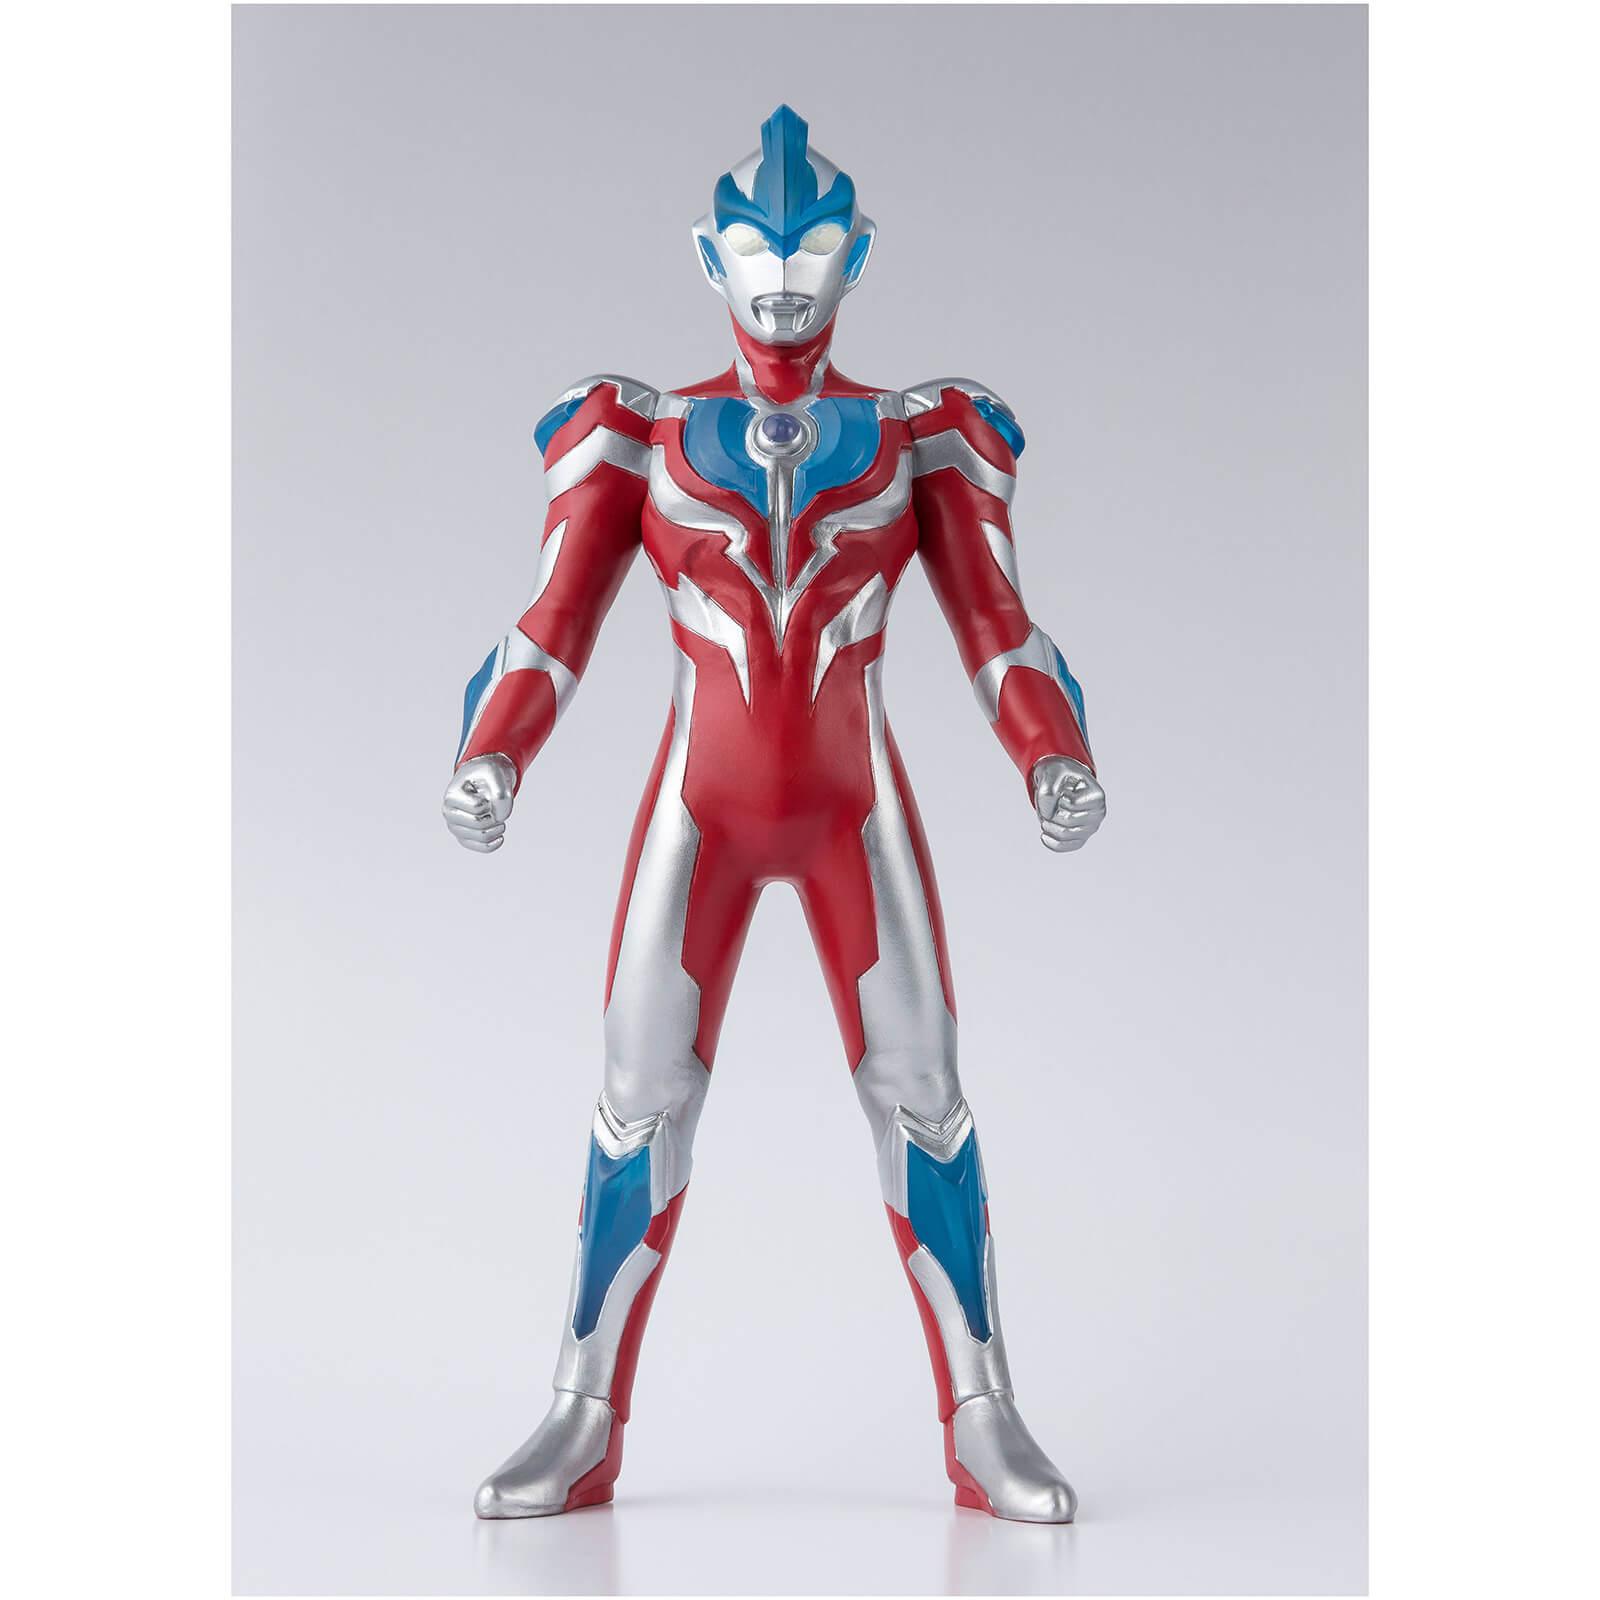 Bandai Tamashii Nations Ultraman Ultraman Ginga Bandai Sofvi Spirits Vinyl Figure